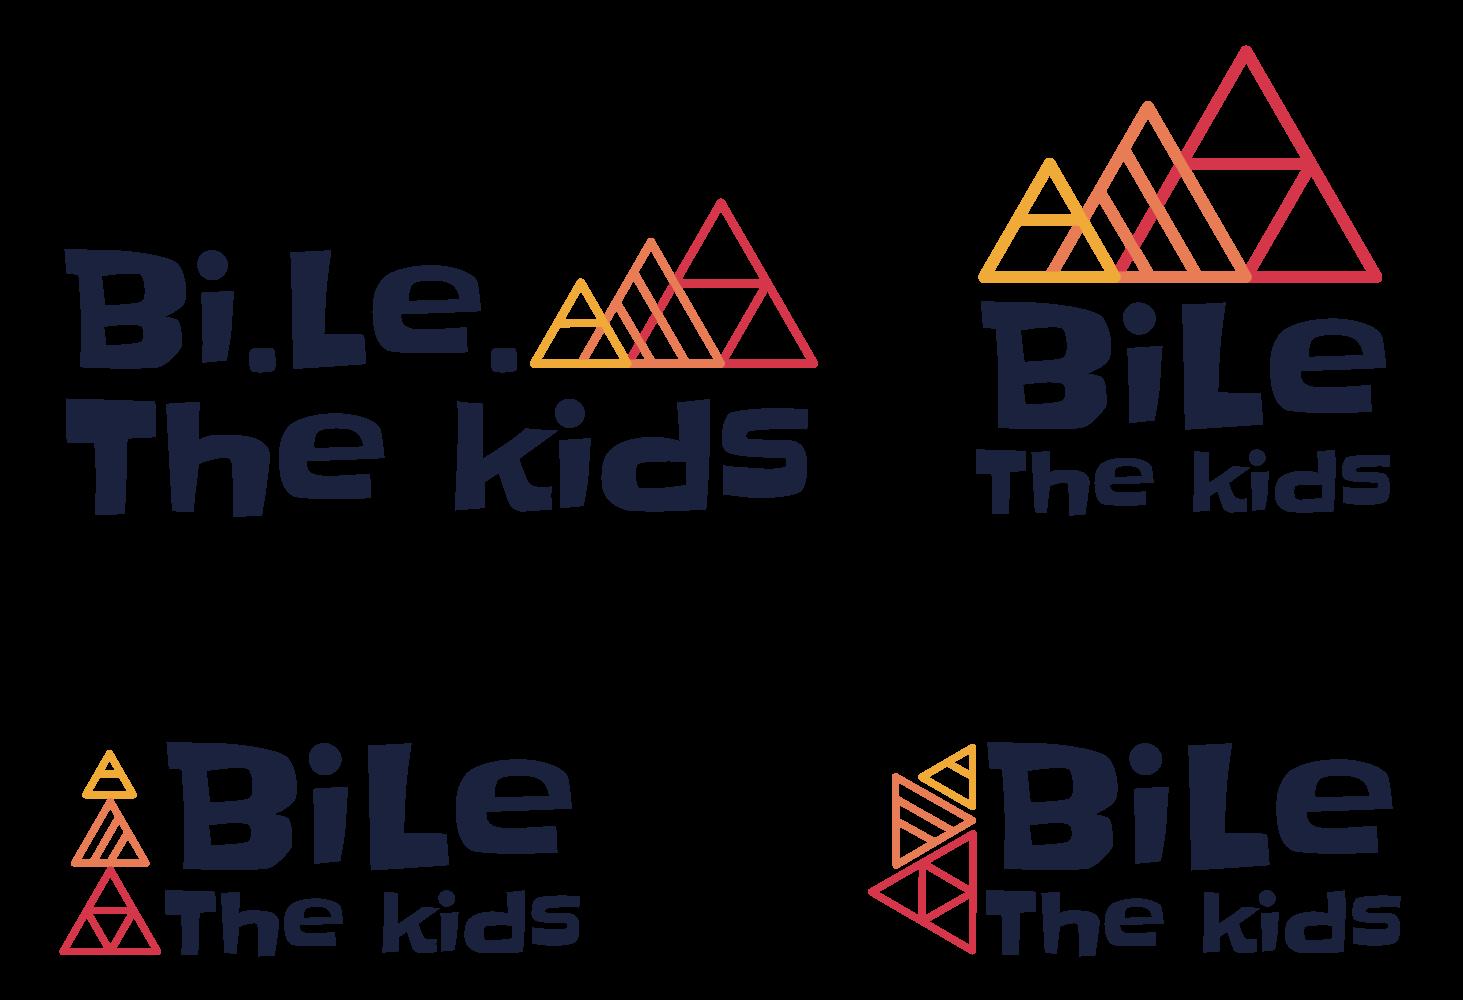 BILETHEKIDS-variaciones-logo